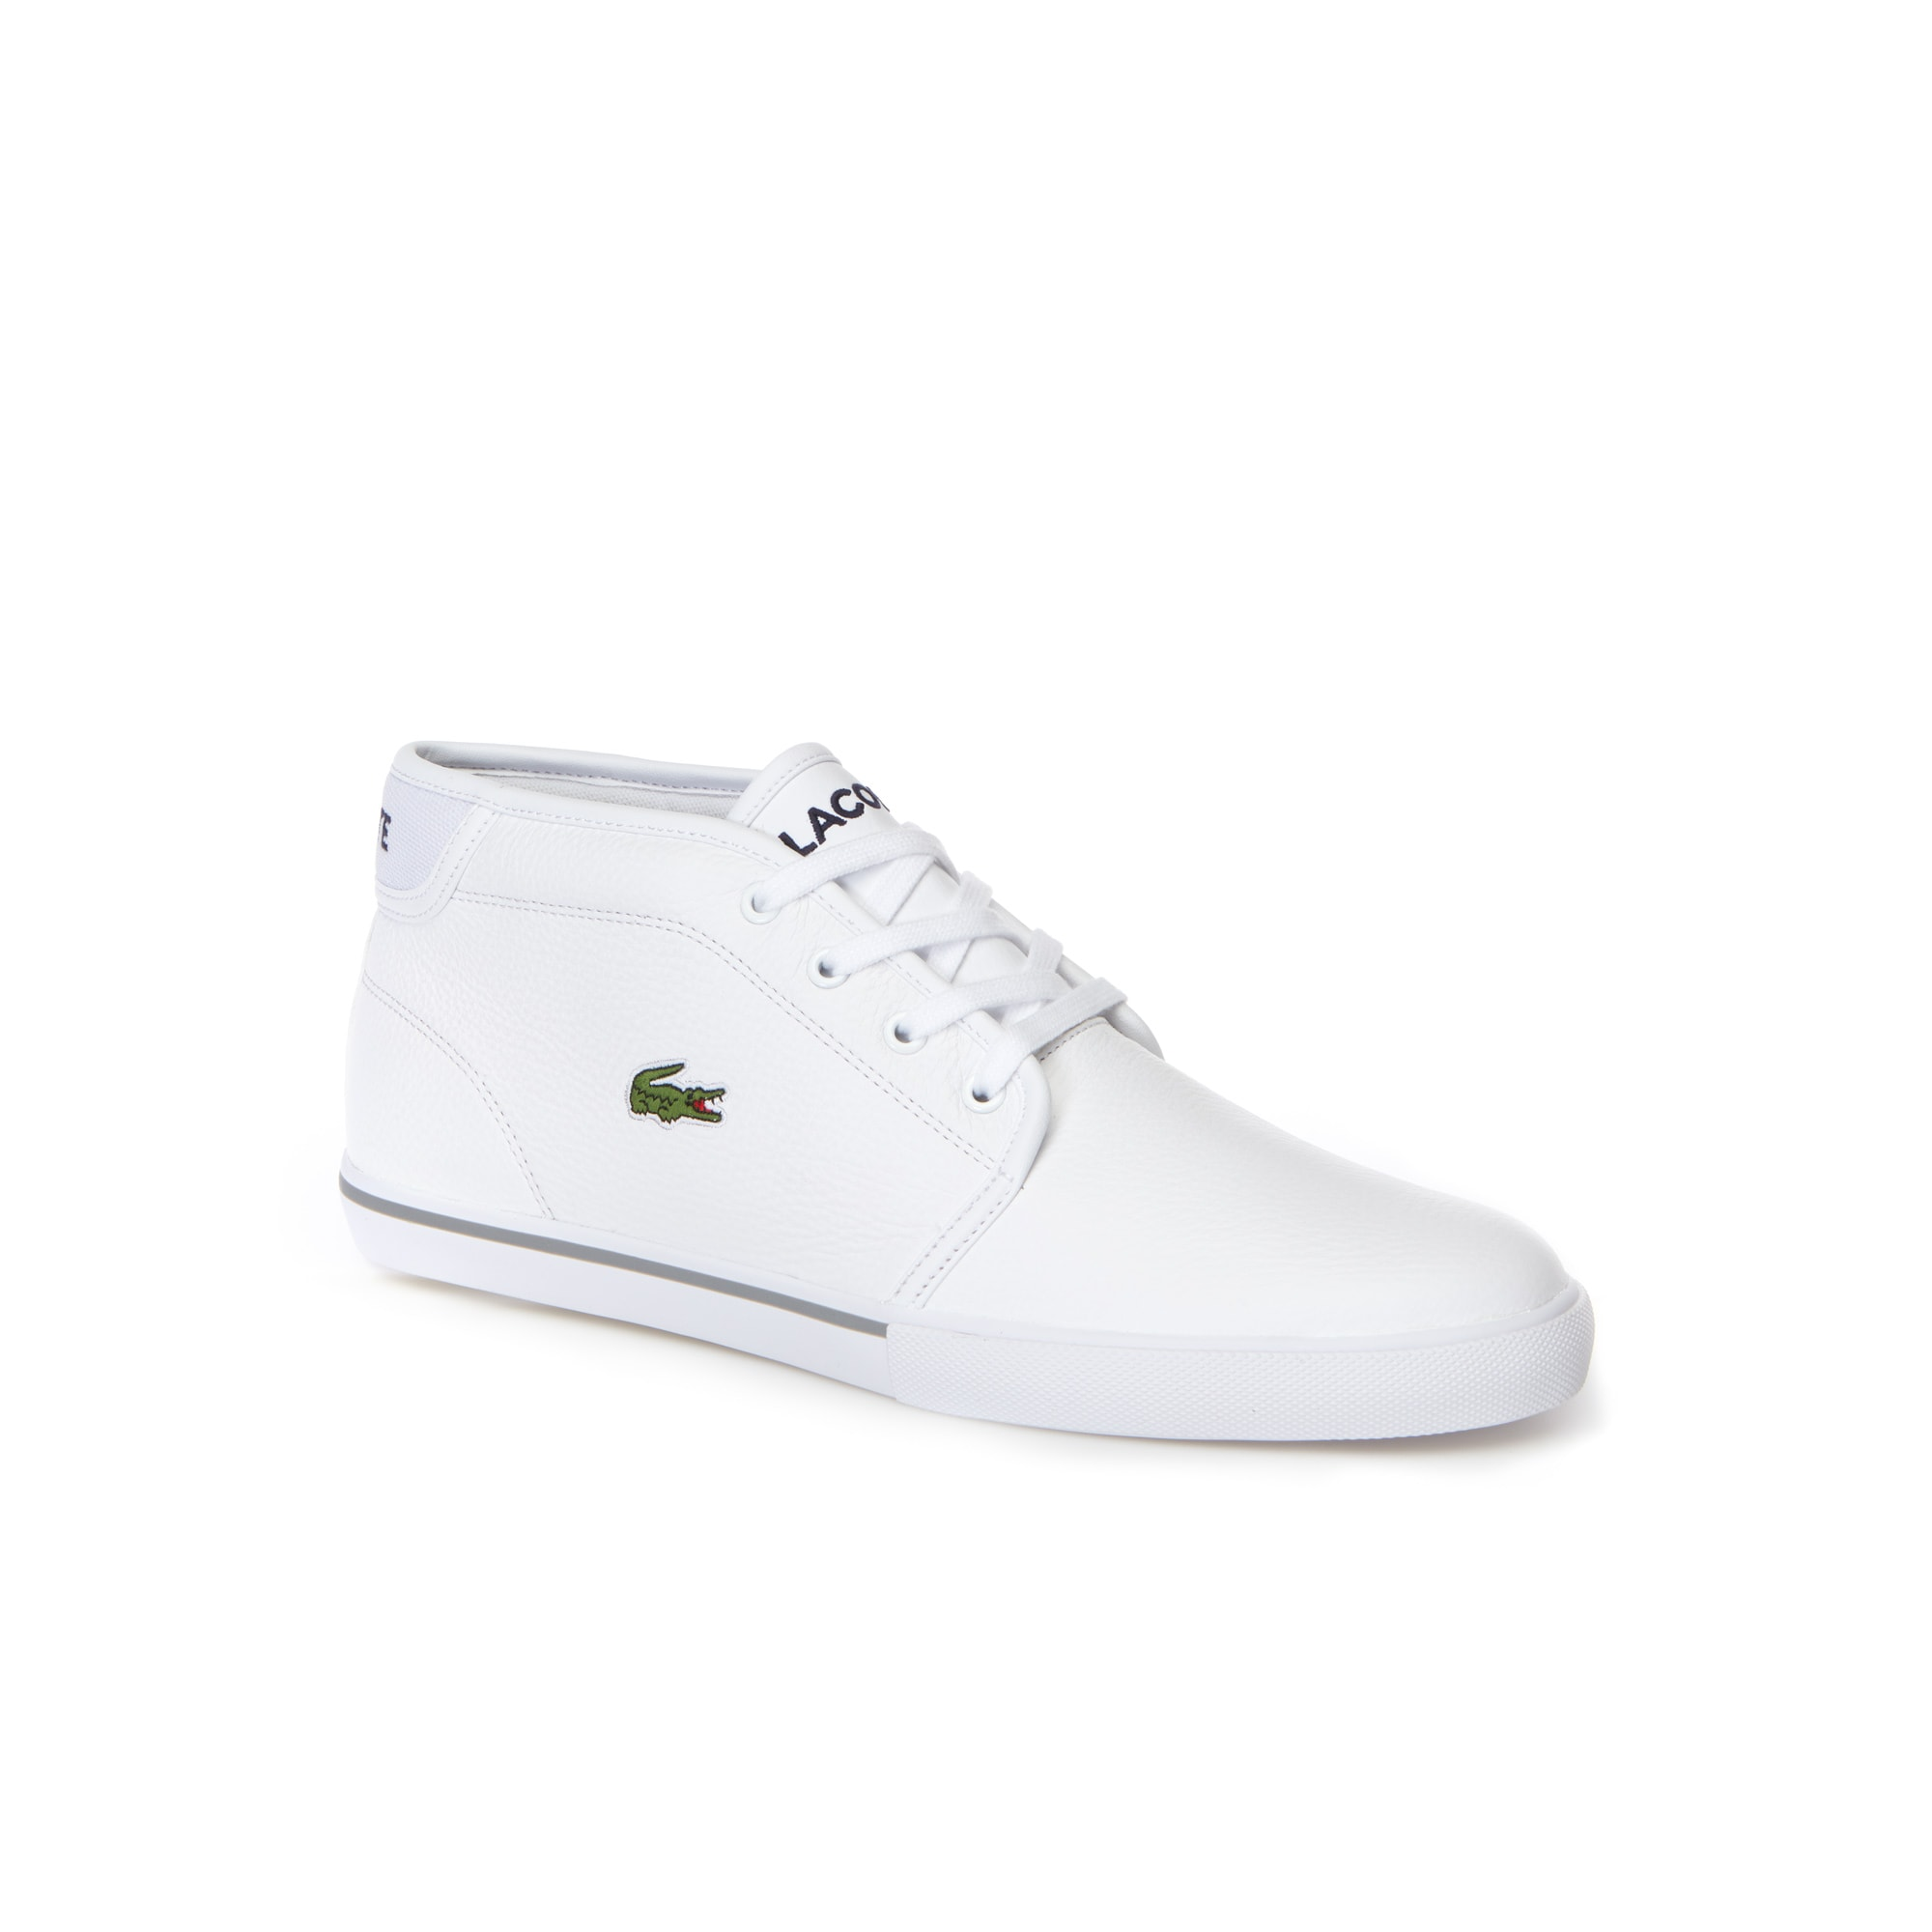 6afa17aa4f Sneakers Ampthill in pelle con bordino ...